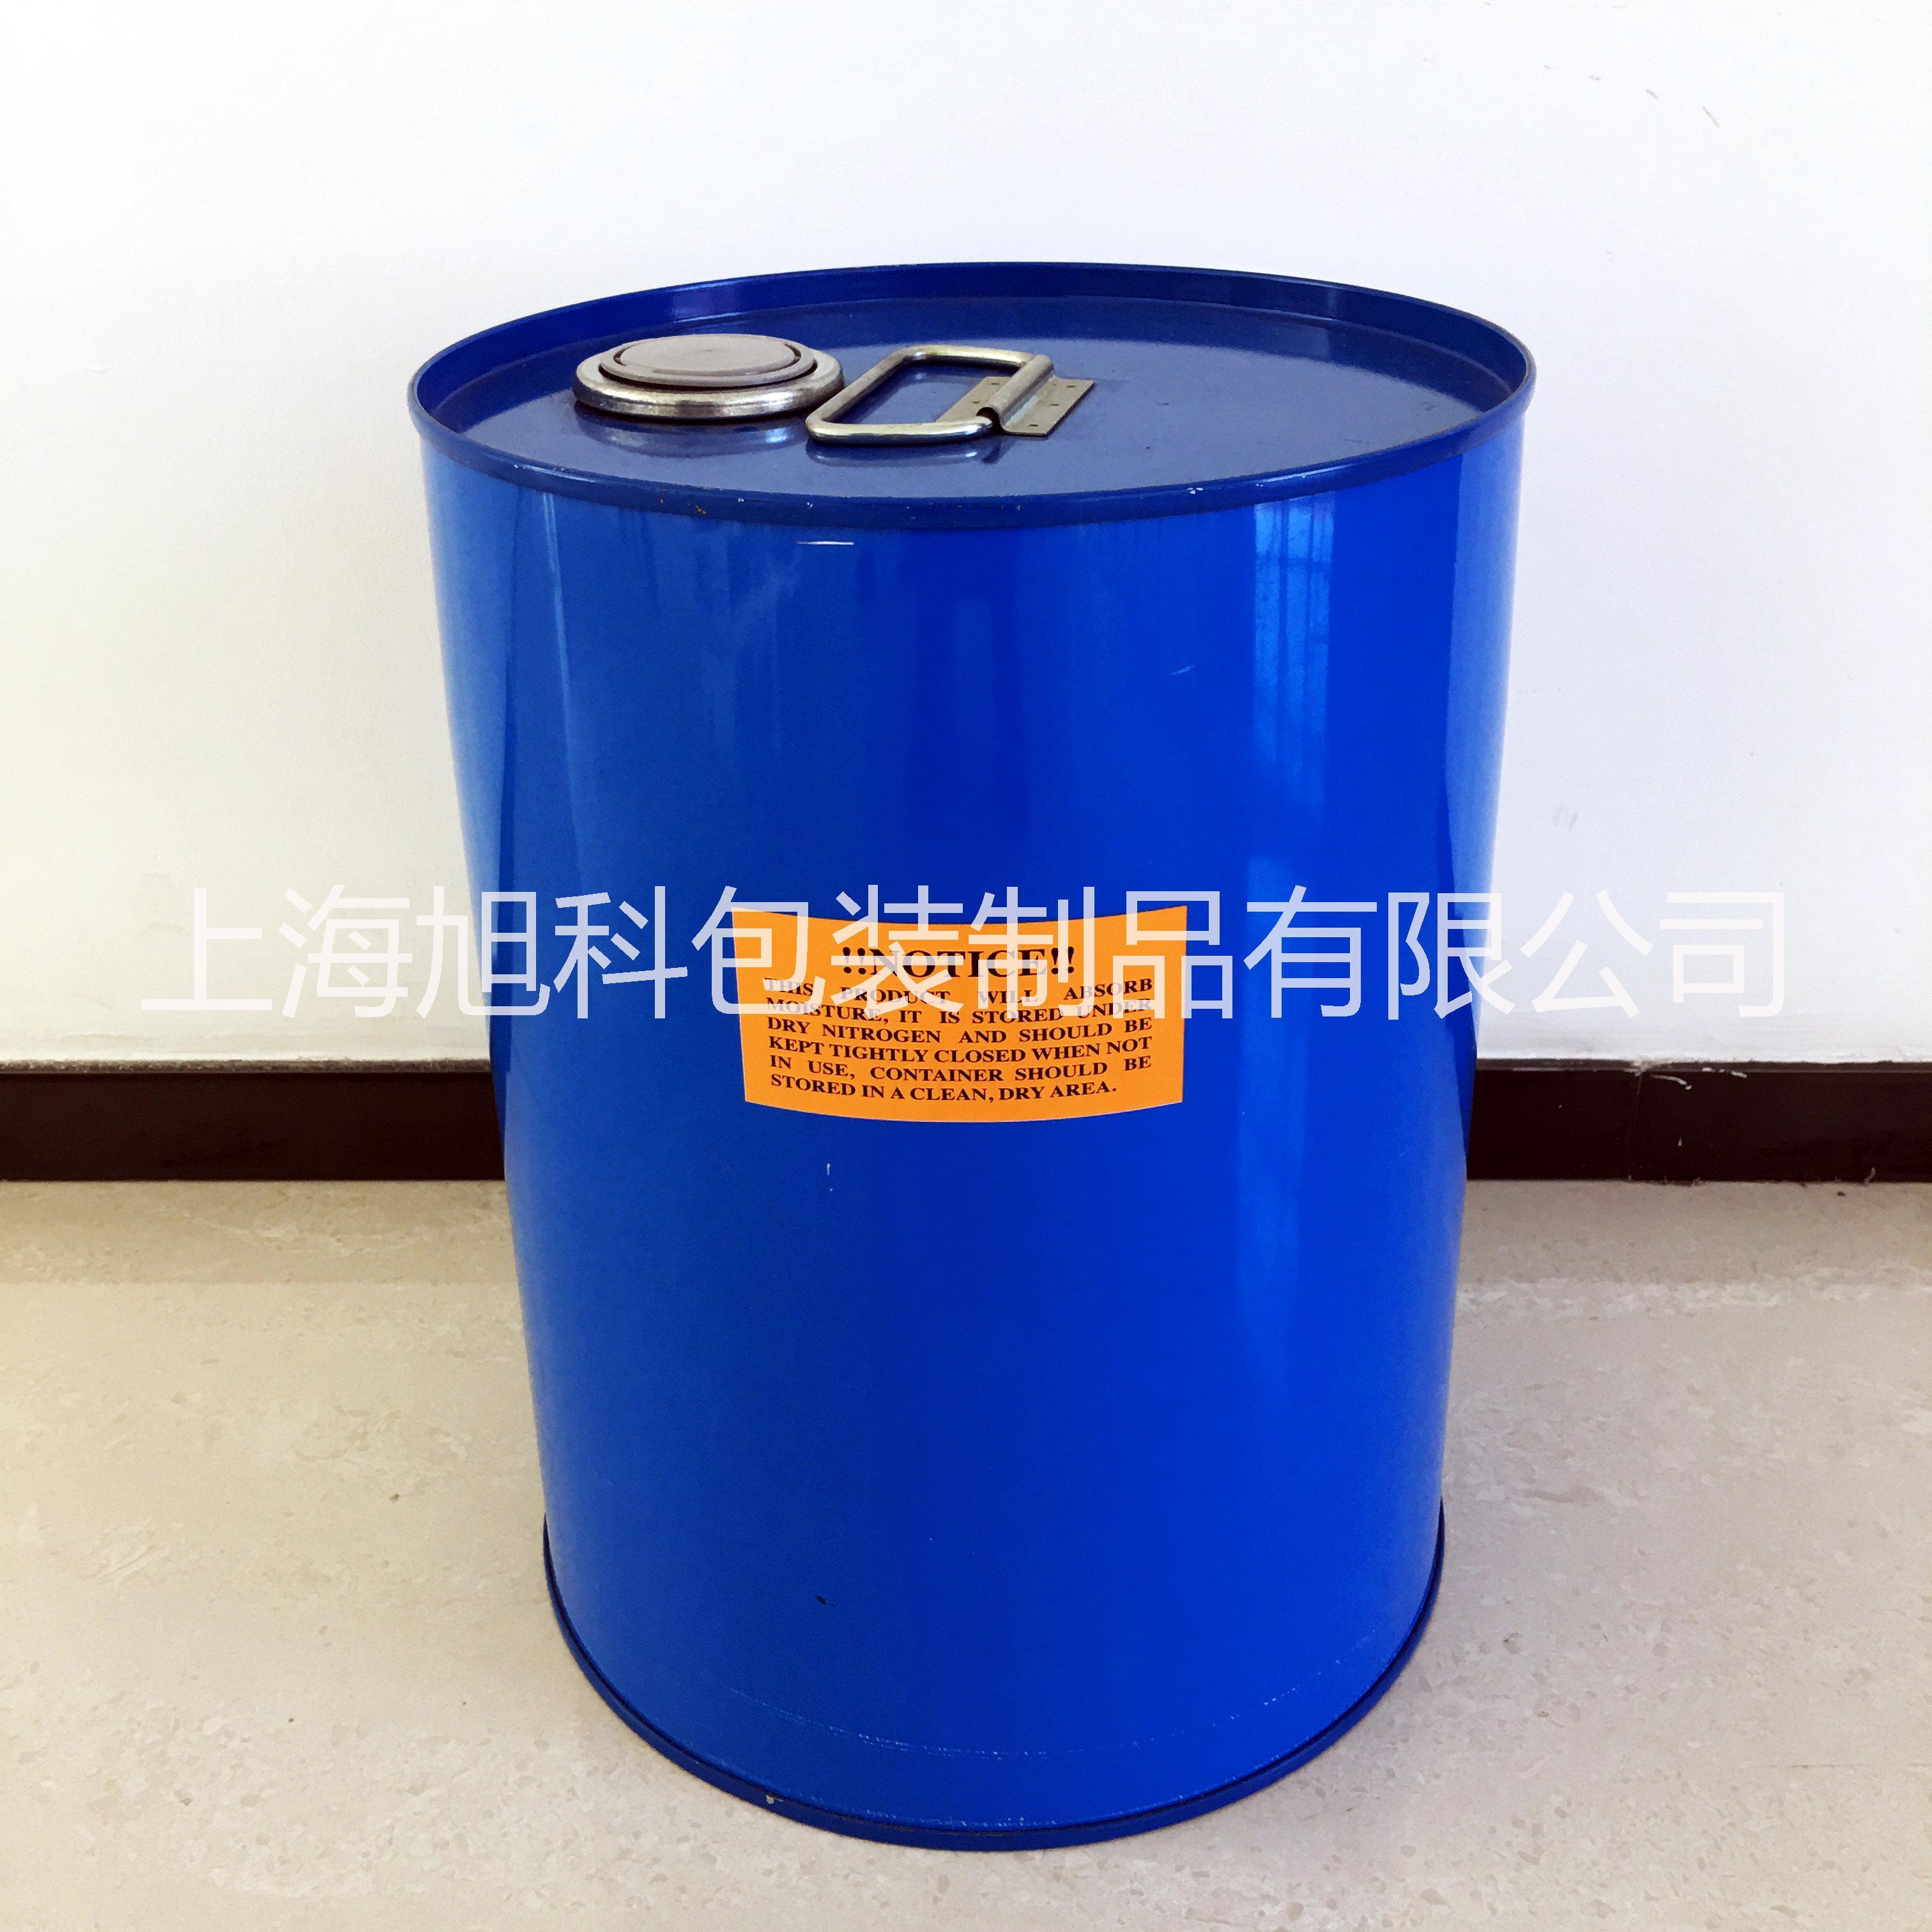 20L冷冻油桶约克桶上海20Kg化工小铁桶加厚机油桶